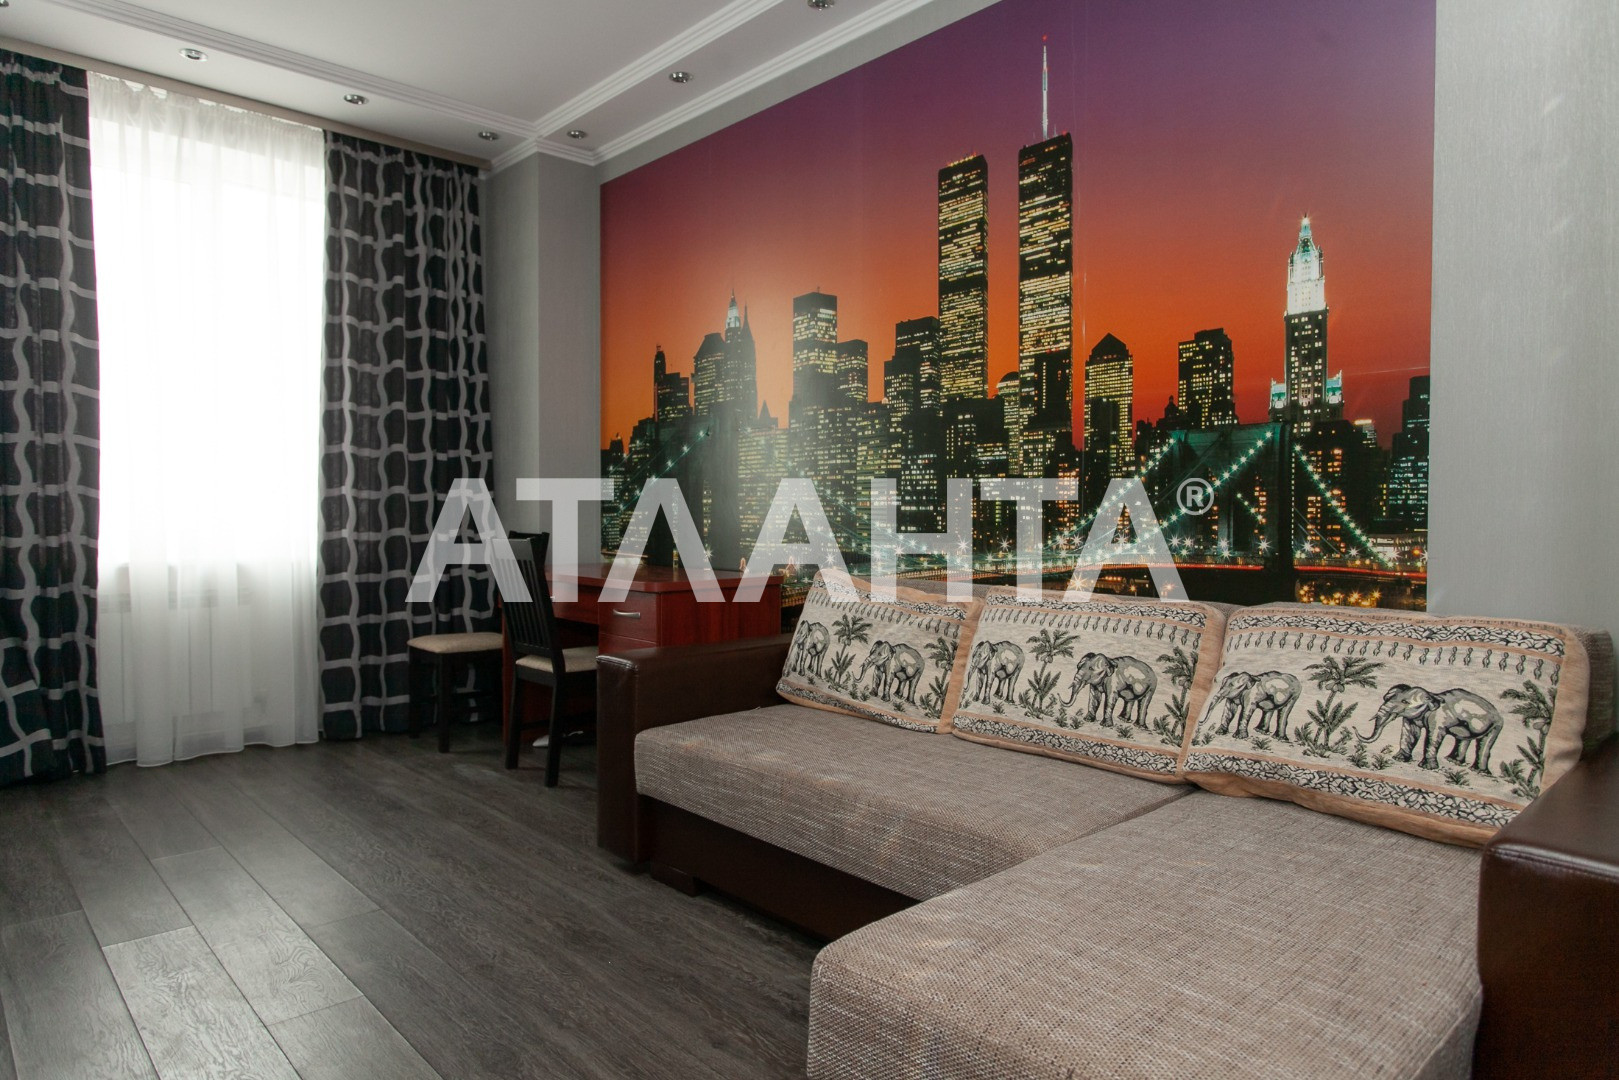 Сдается 3-комнатная Квартира на ул. Базарная (Кирова) — 700 у.е./мес.